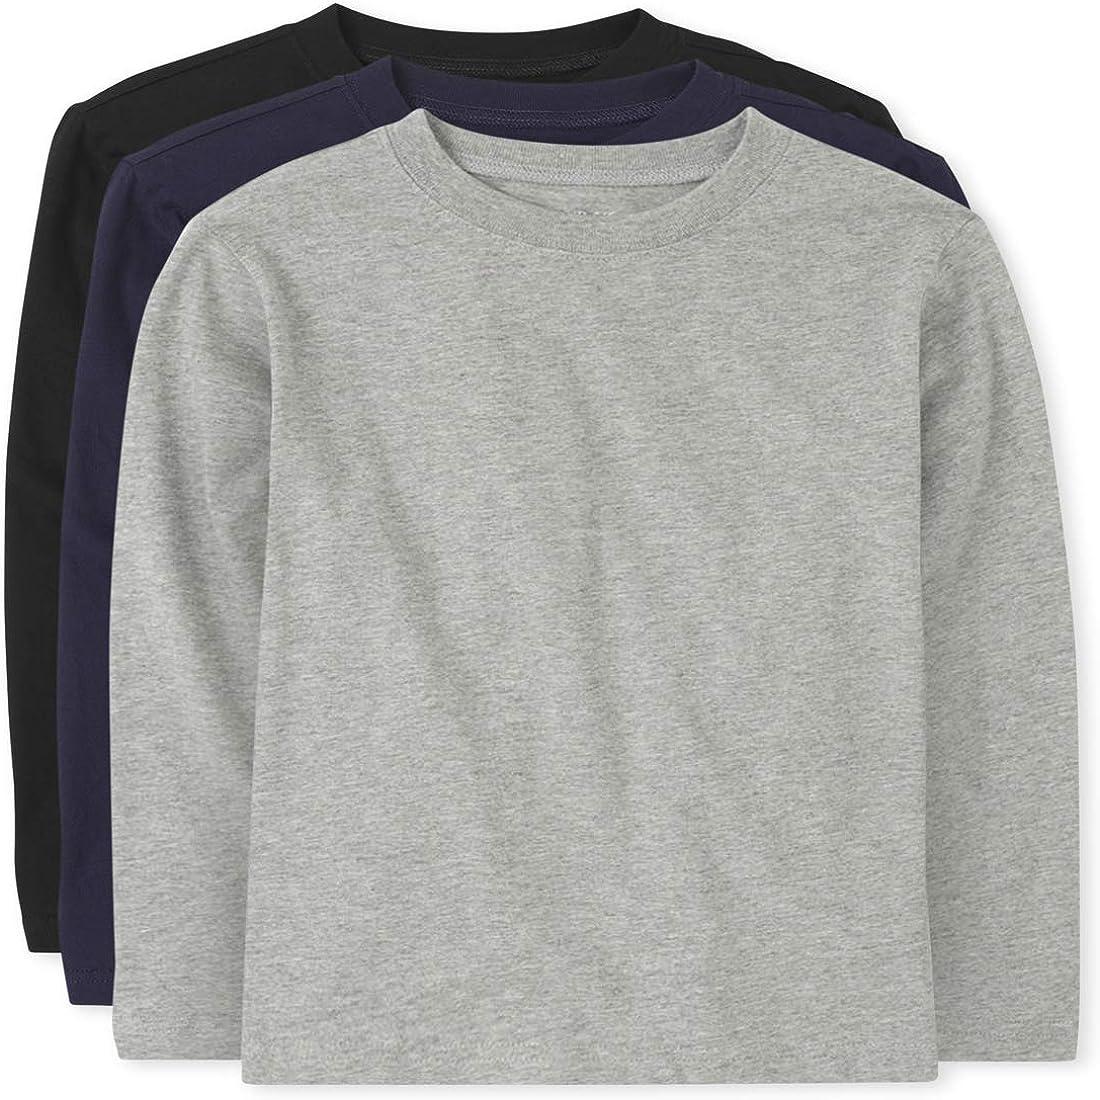 The Children's Place Boys' Long-awaited Uniform 4-Pack Phoenix Mall Basic Tee Layering